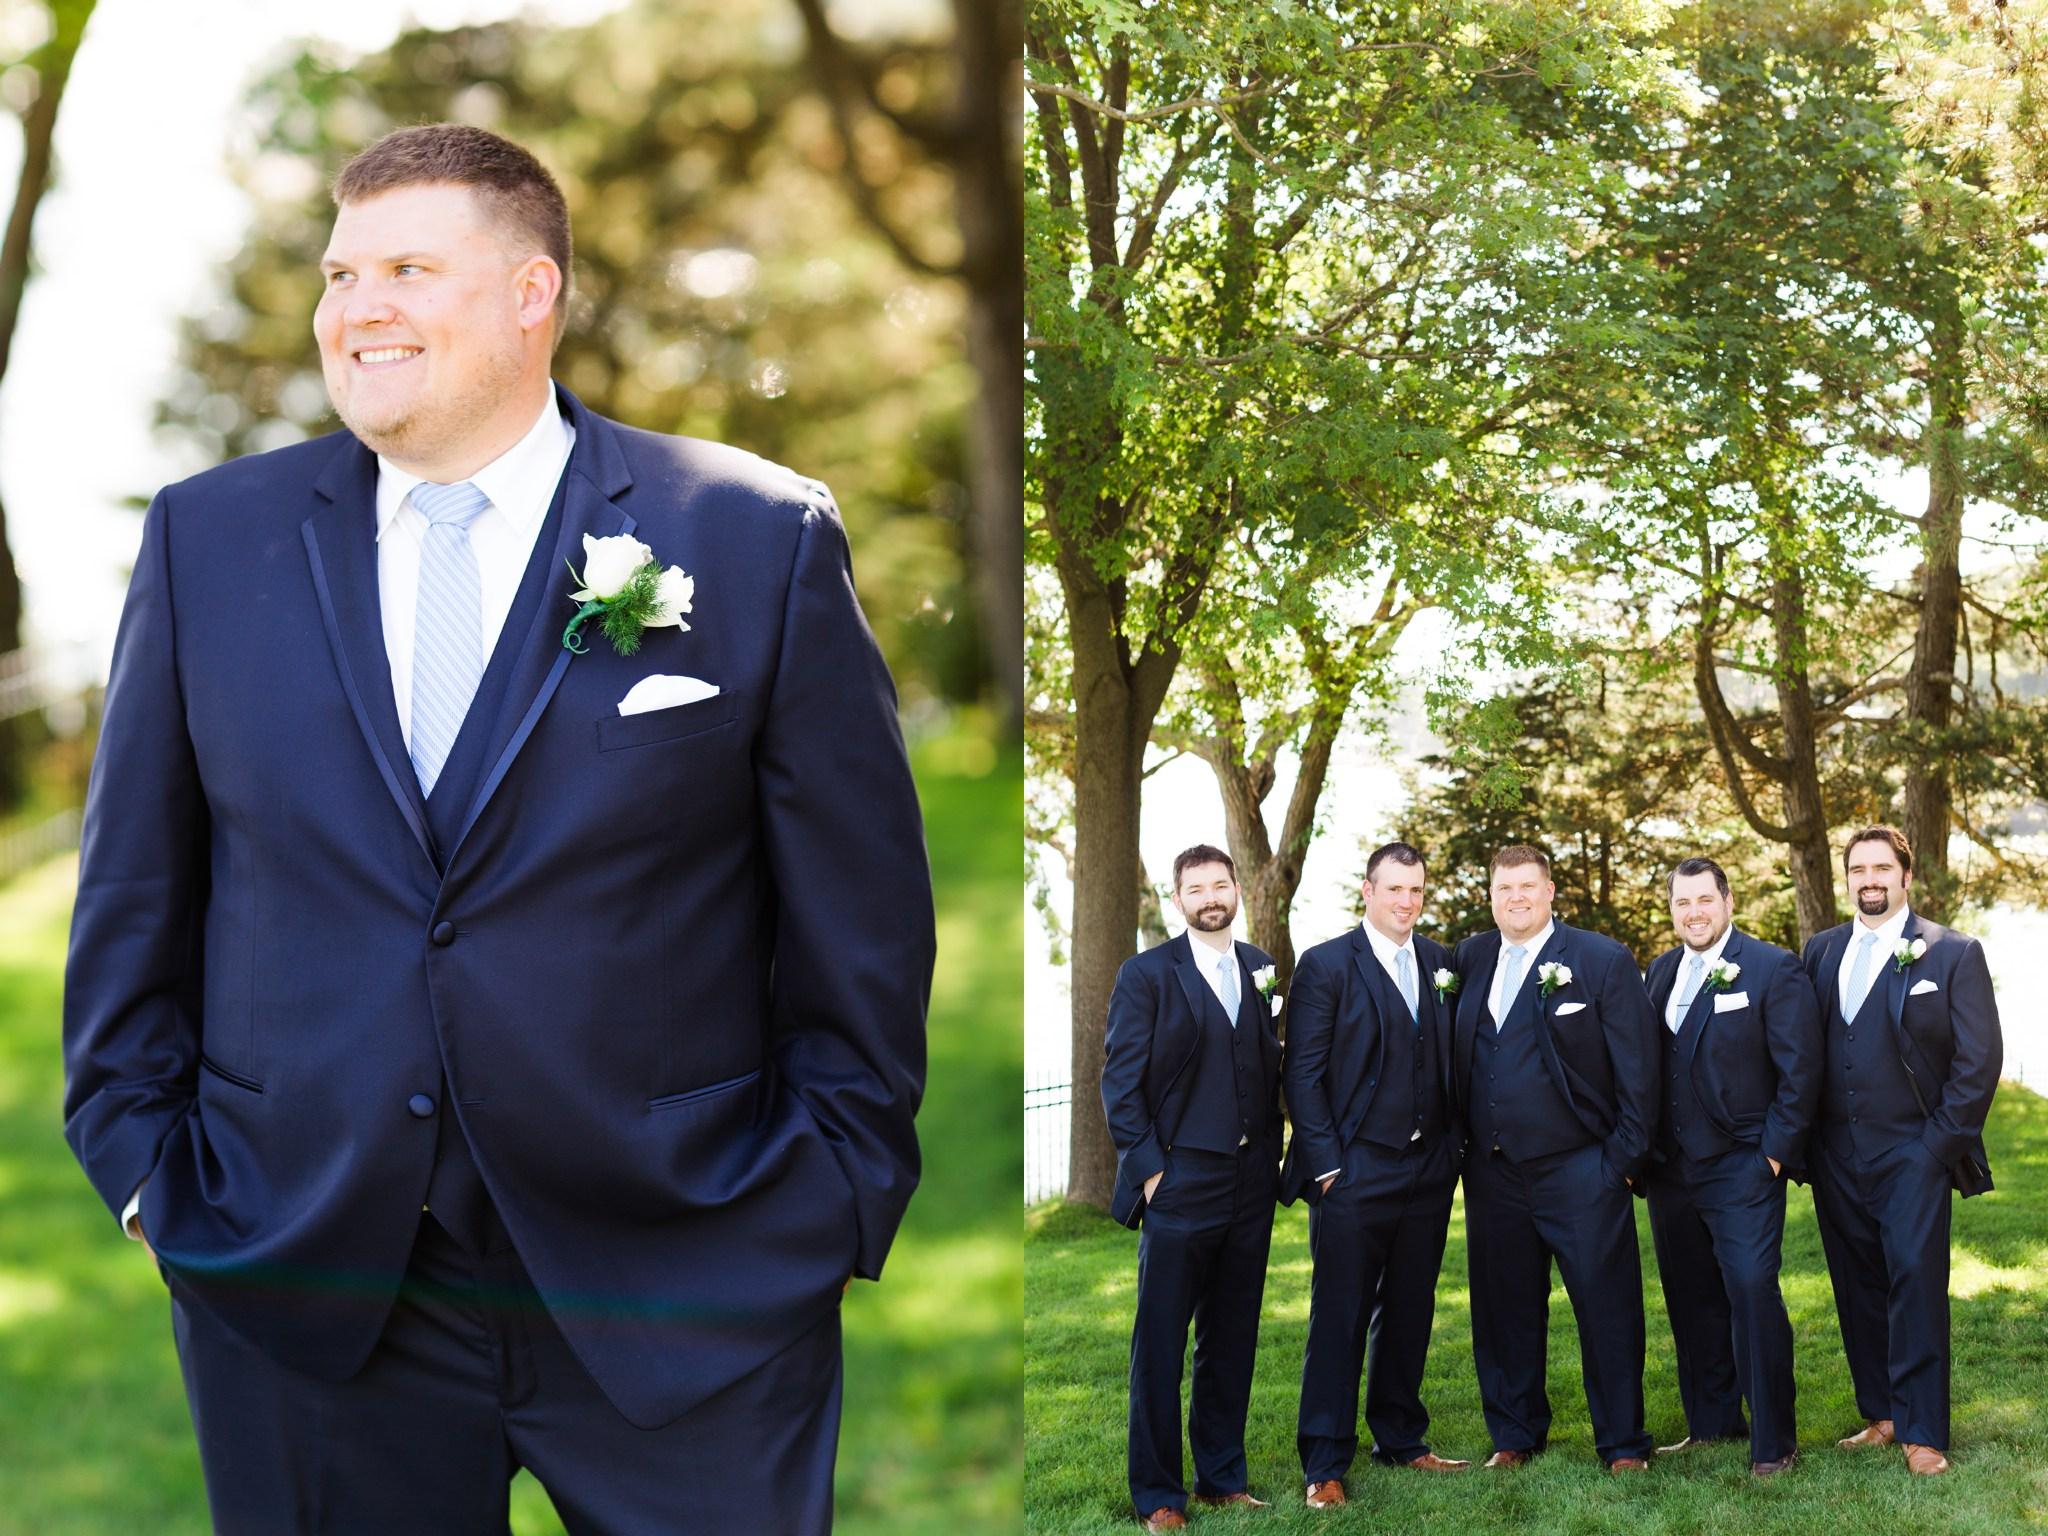 misselwood_endicott_college_wedding_photos_00032.JPG